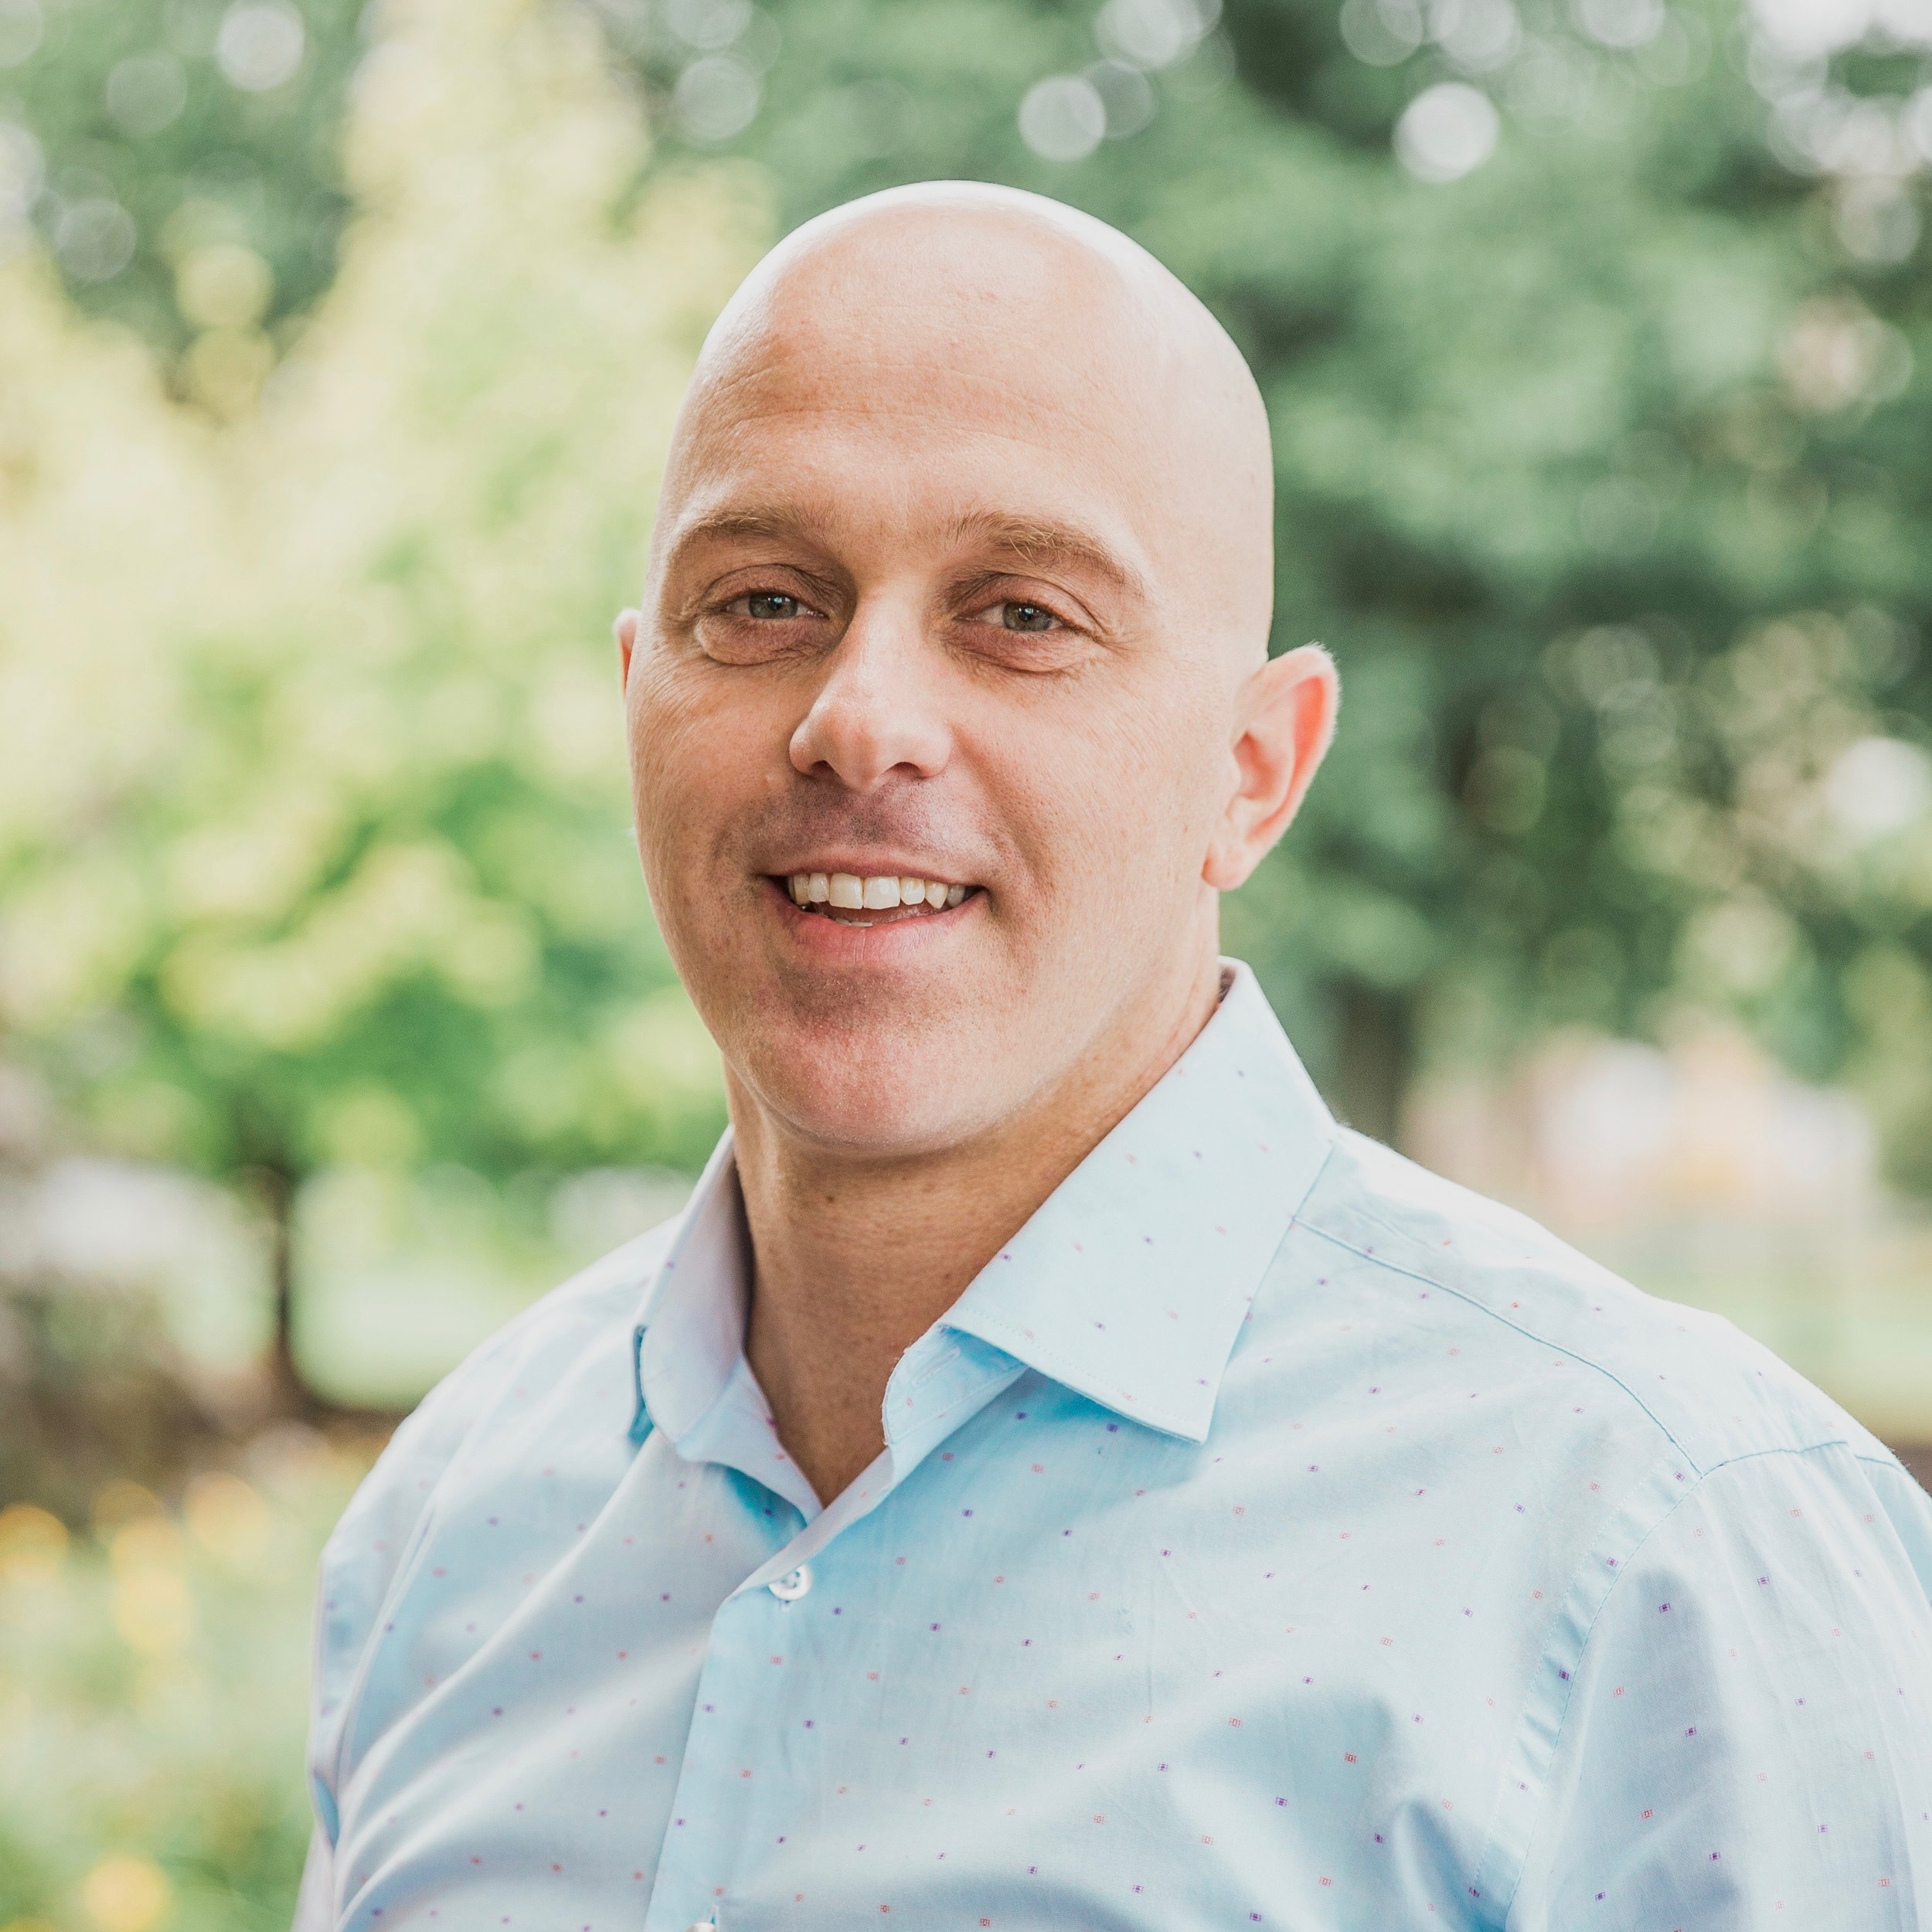 Daniel Hood | Lead Pastor, Visionary Leadership